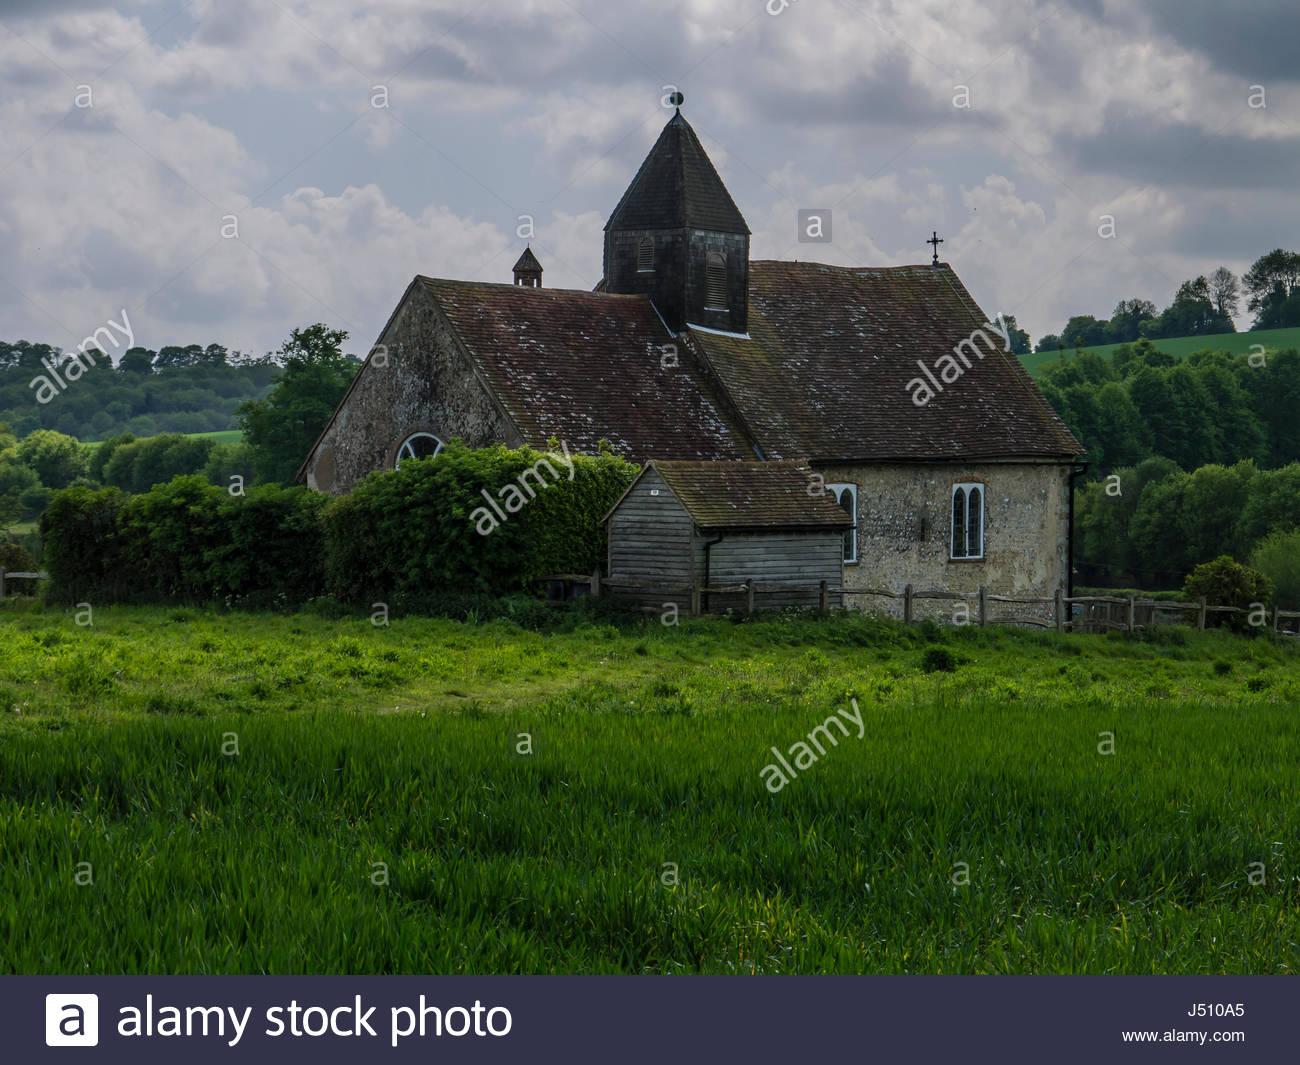 St.-Hubertus Kirche Idsworth Finchdean Hampshire England Stockbild